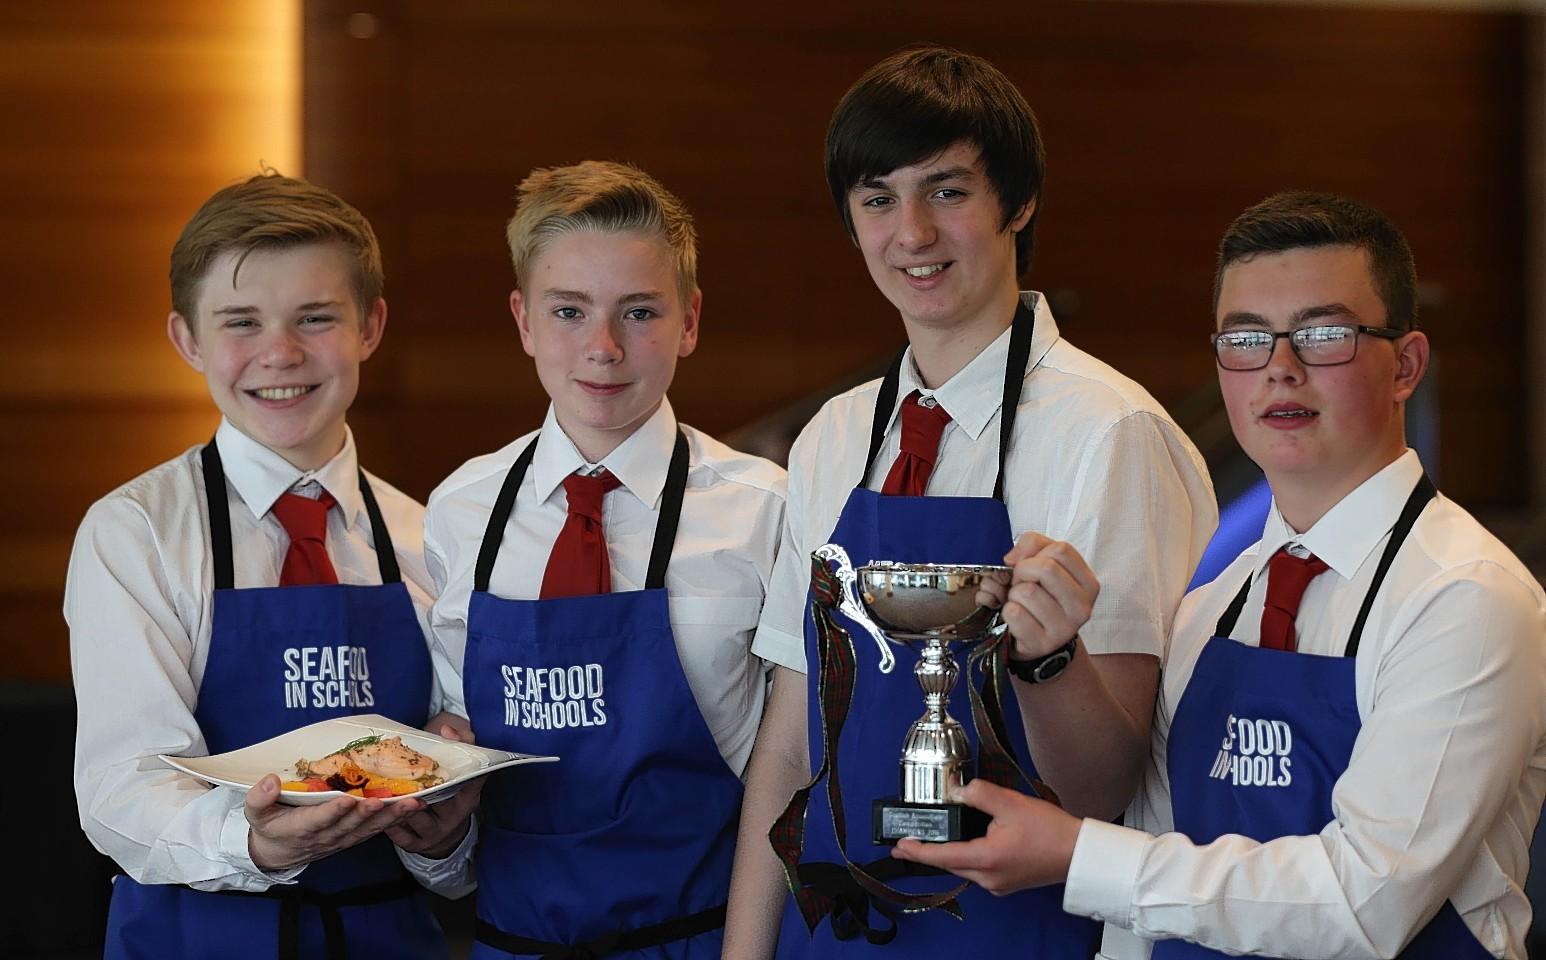 (Left to right) Fraser Nicol,Flett Marshal,Ewan McAtire,Jay Brady from Glen Urquhart High School